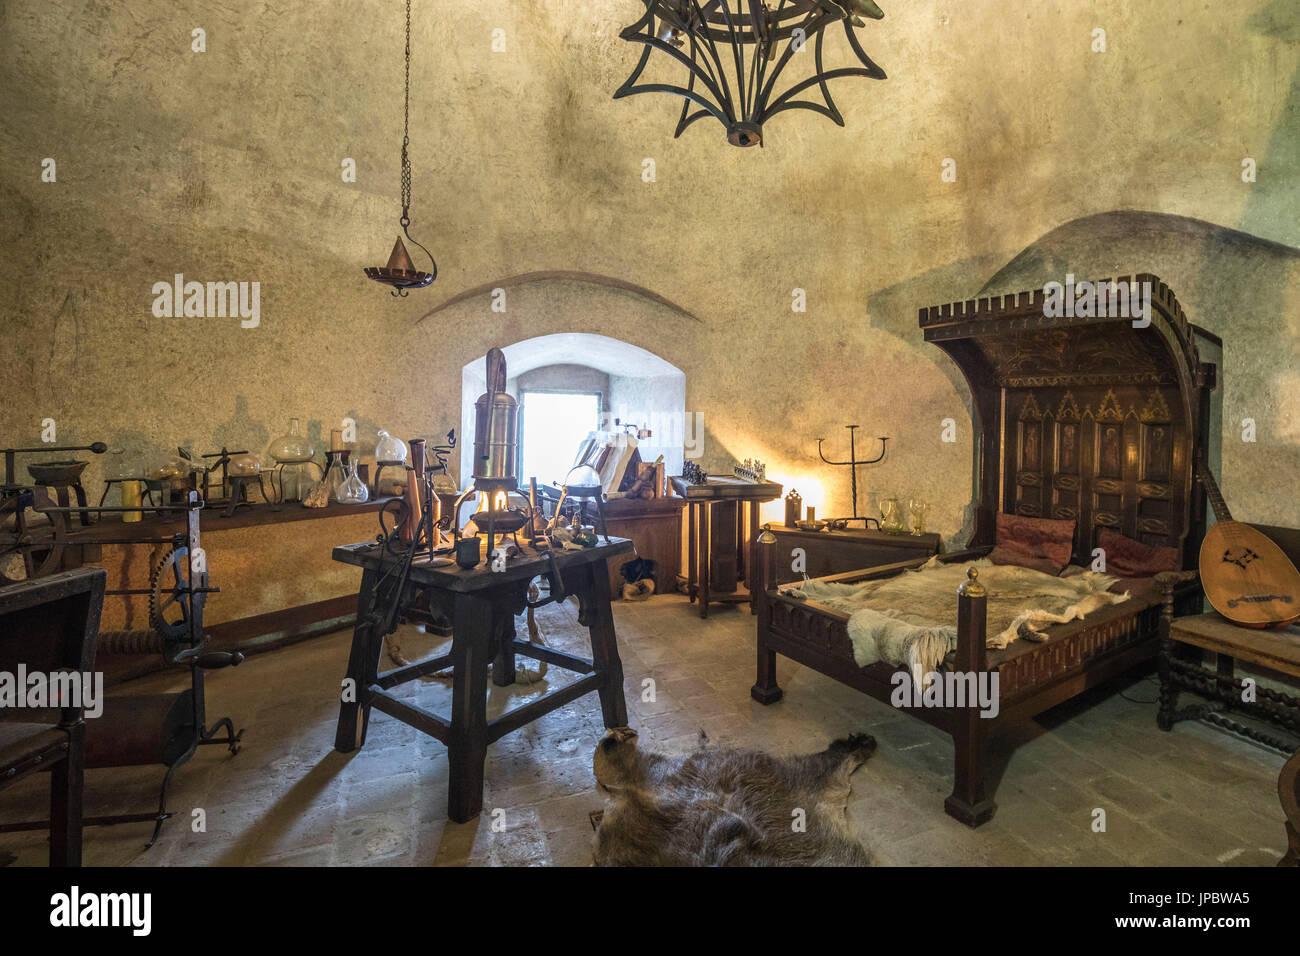 Ancient Bedroom And Furniture Inside Prague Castle Czech Republic Europe